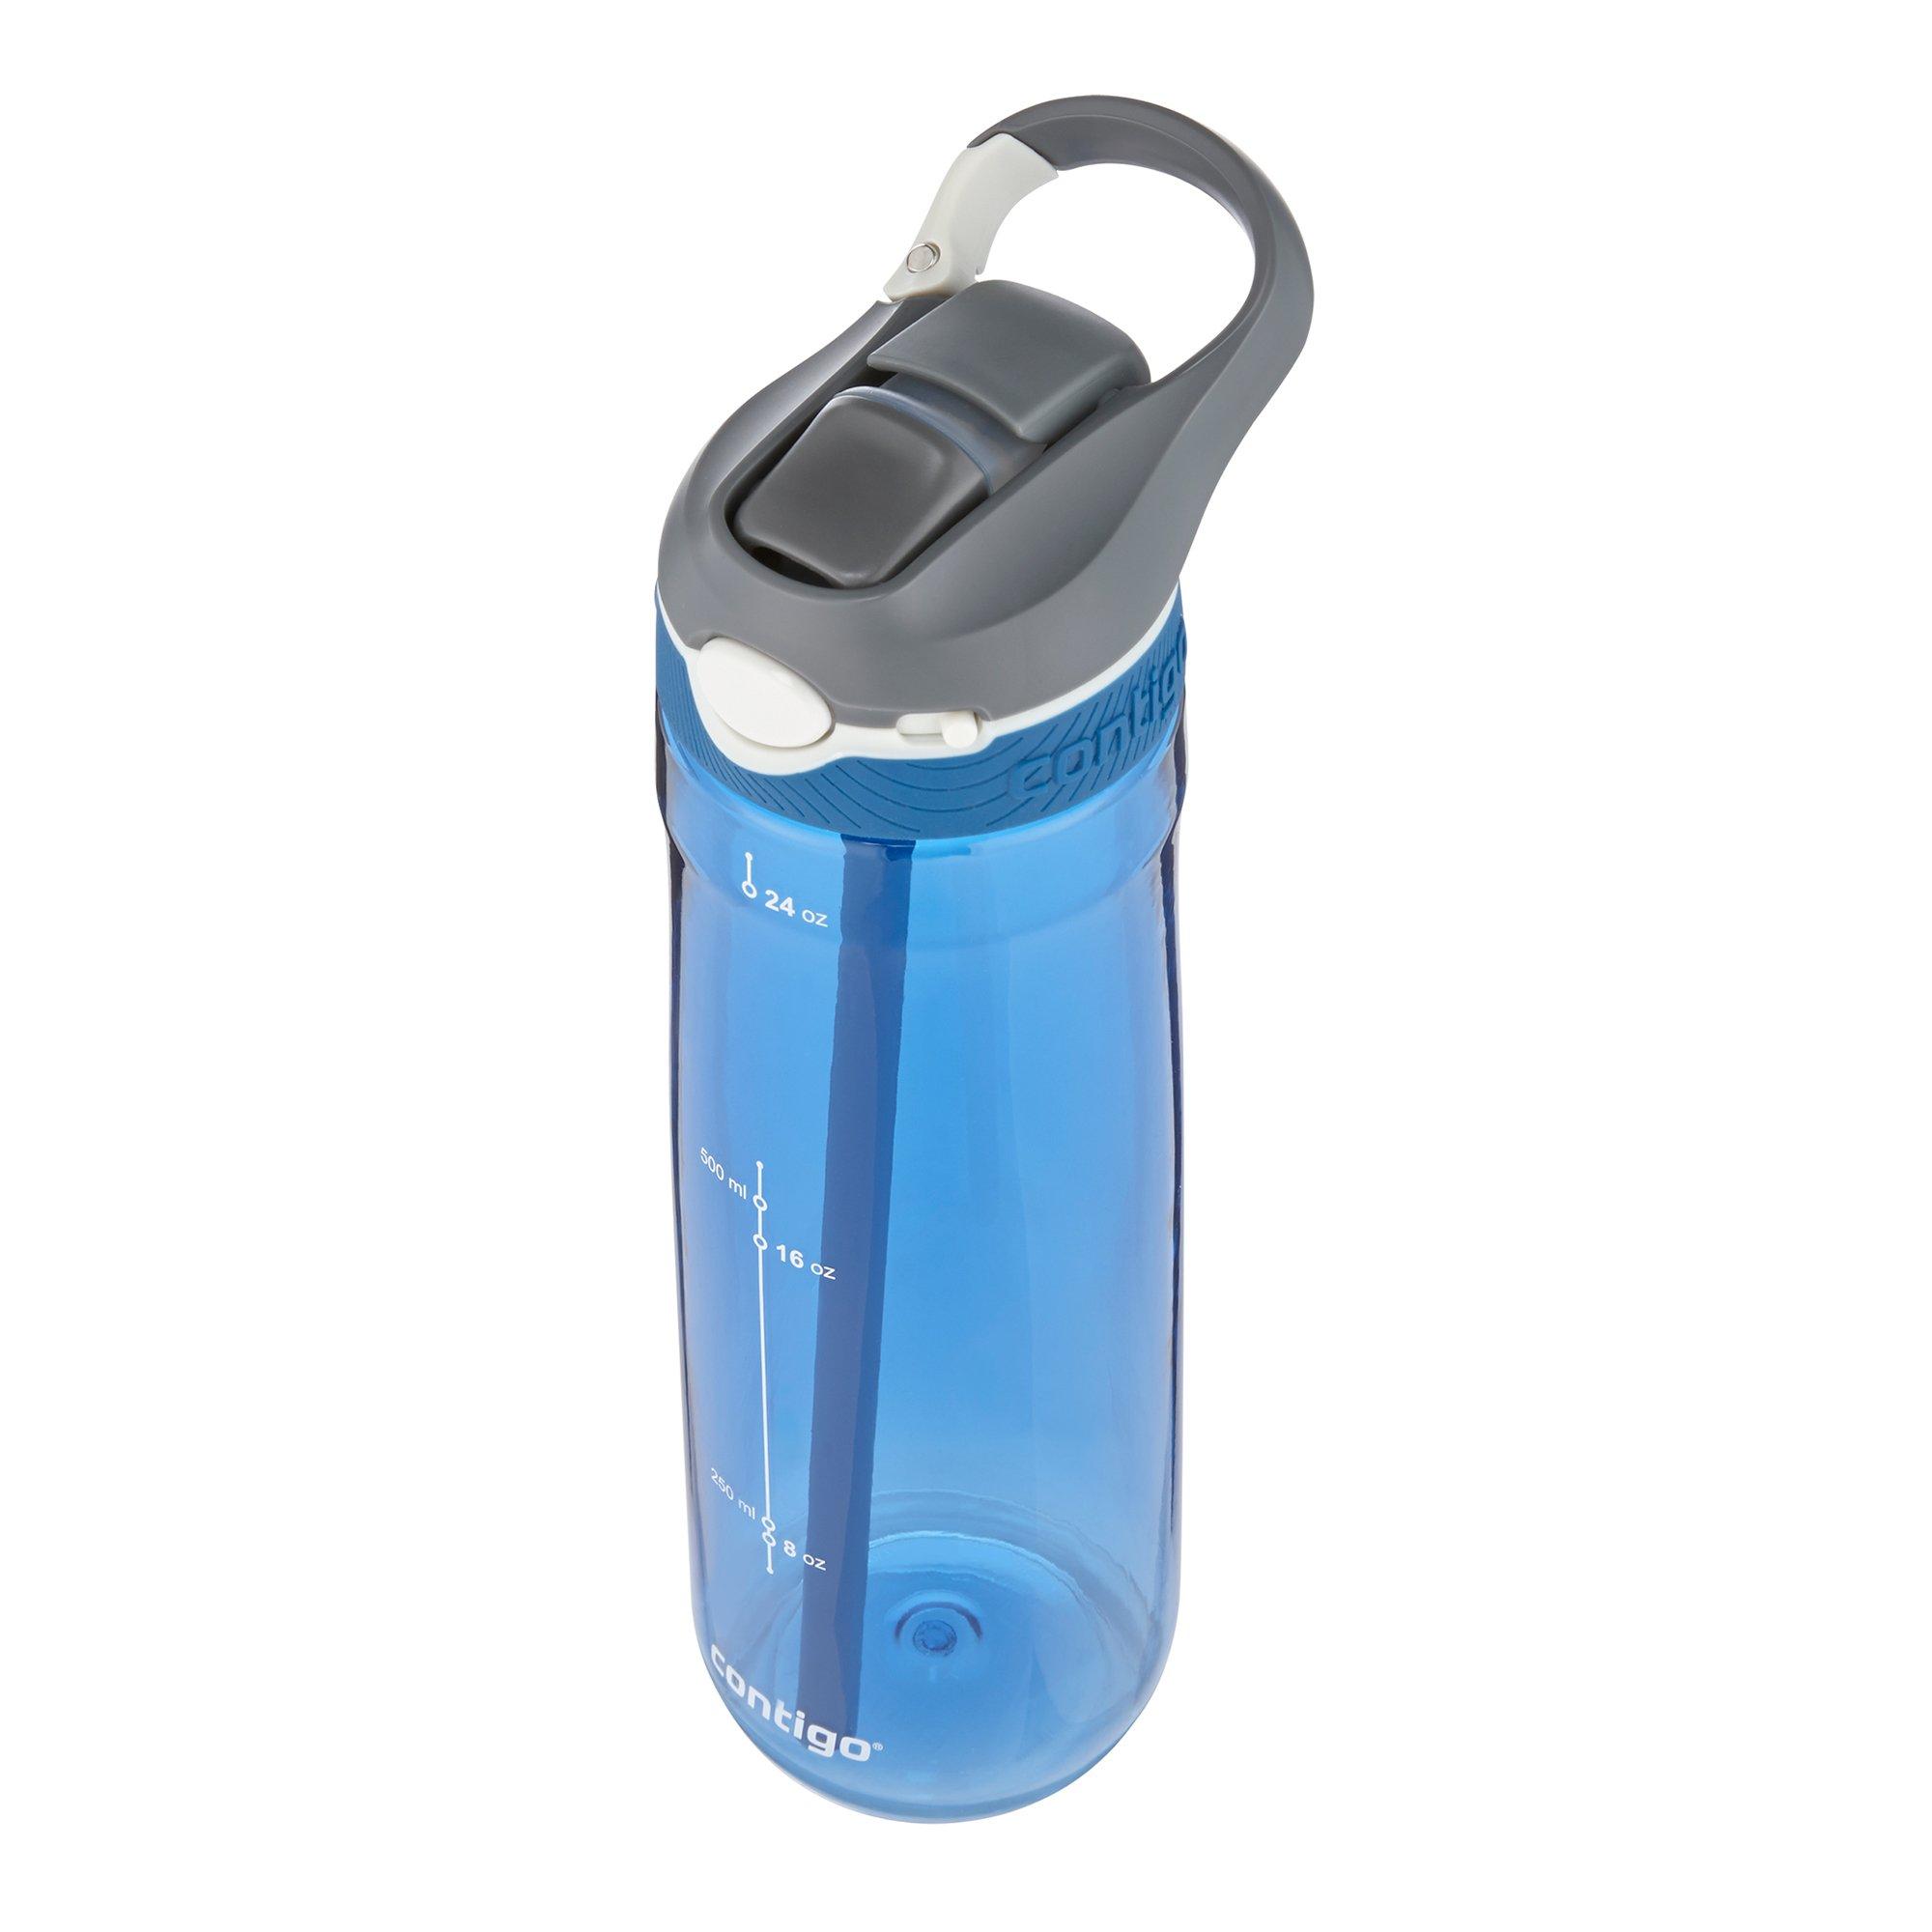 Contigo AUTOSPOUT Straw Ashland Water Bottle, 24 oz, Stormy Weather/Vibrant Lime/Monaco, 3-pack by Contigo (Image #2)